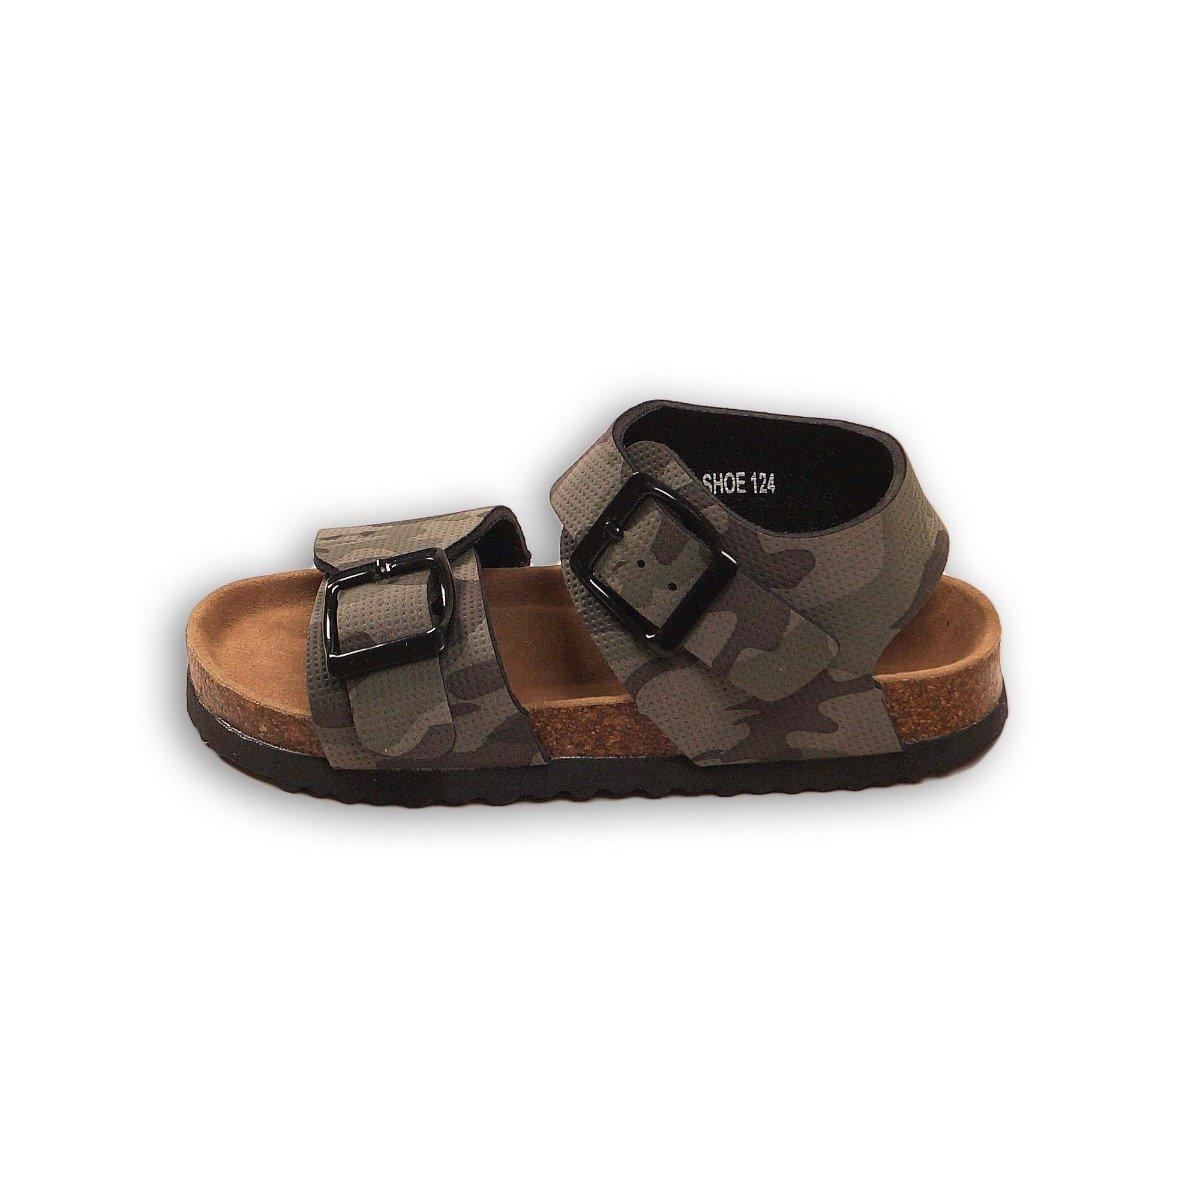 Sandale cu imprimeu total camuflaj, Minoti Shoe